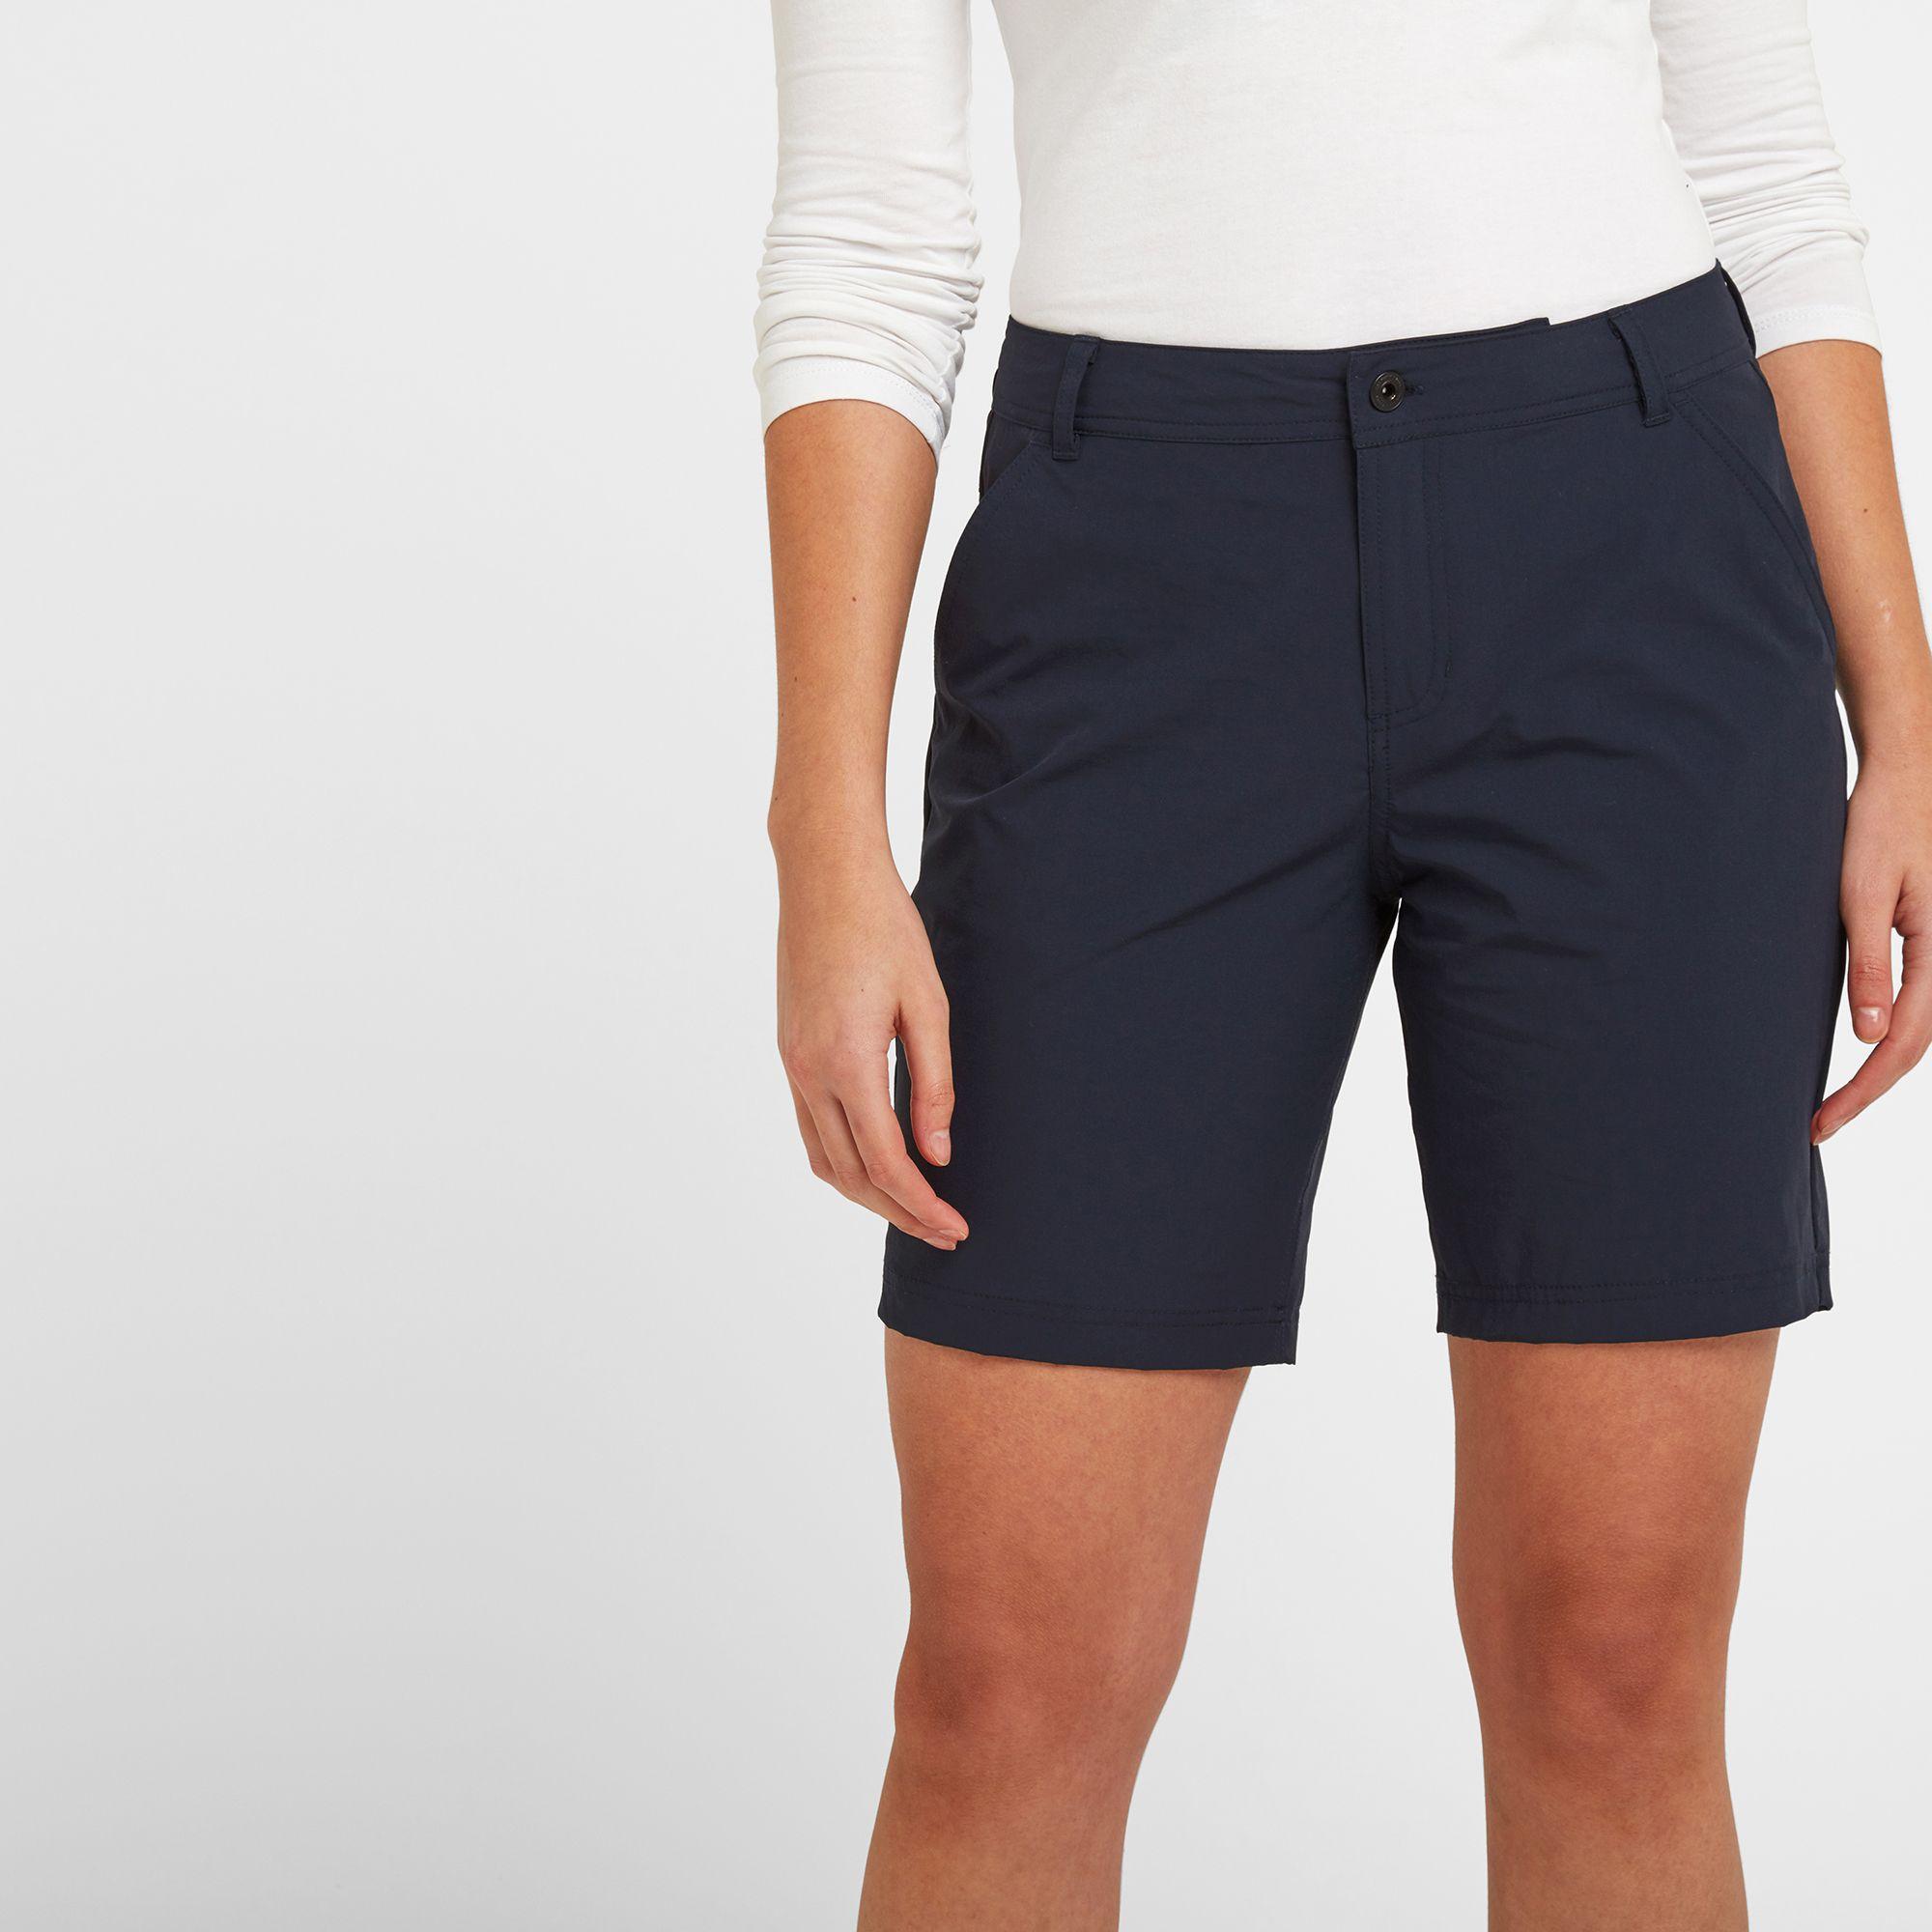 Denver Womens Shorts Navy